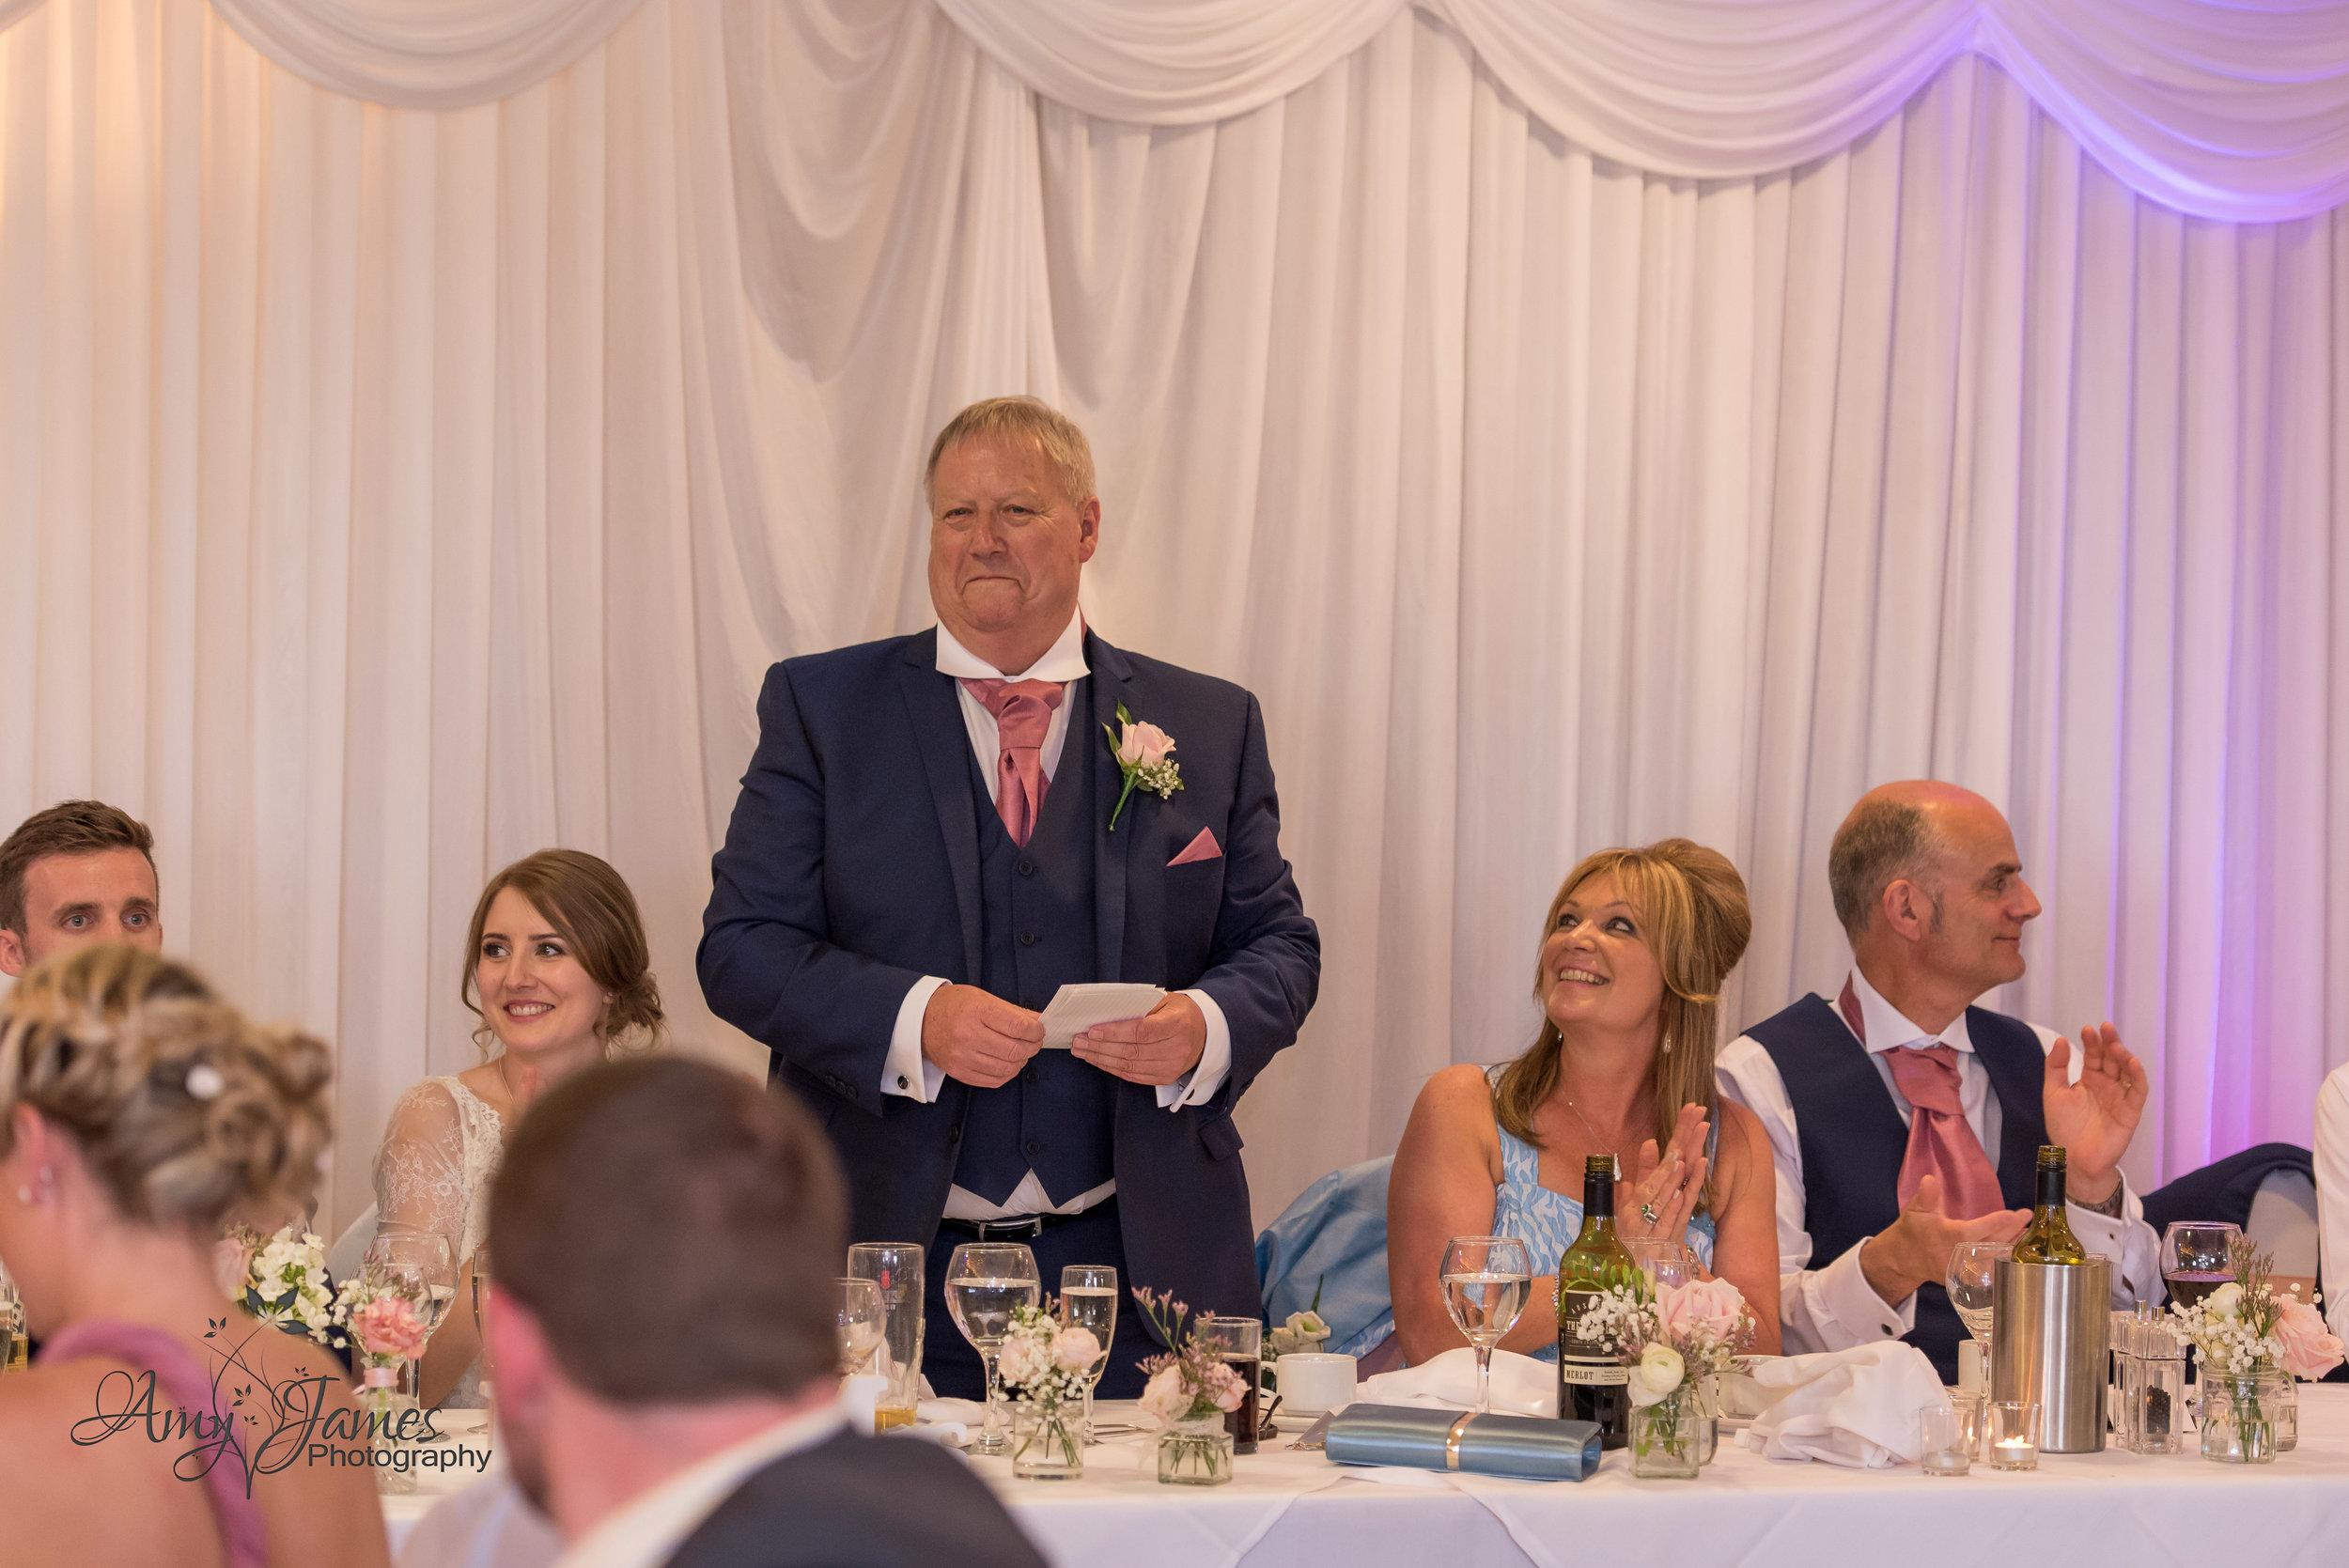 Hampshire wedding Photographer | Fleet wedding photographer | Highfield Park Wedding Photographer | Highfield Park Wedding Venue |Surrey Wedding photographer | Spring Wedding | Amy James Photography | UK outdoor wedding venue